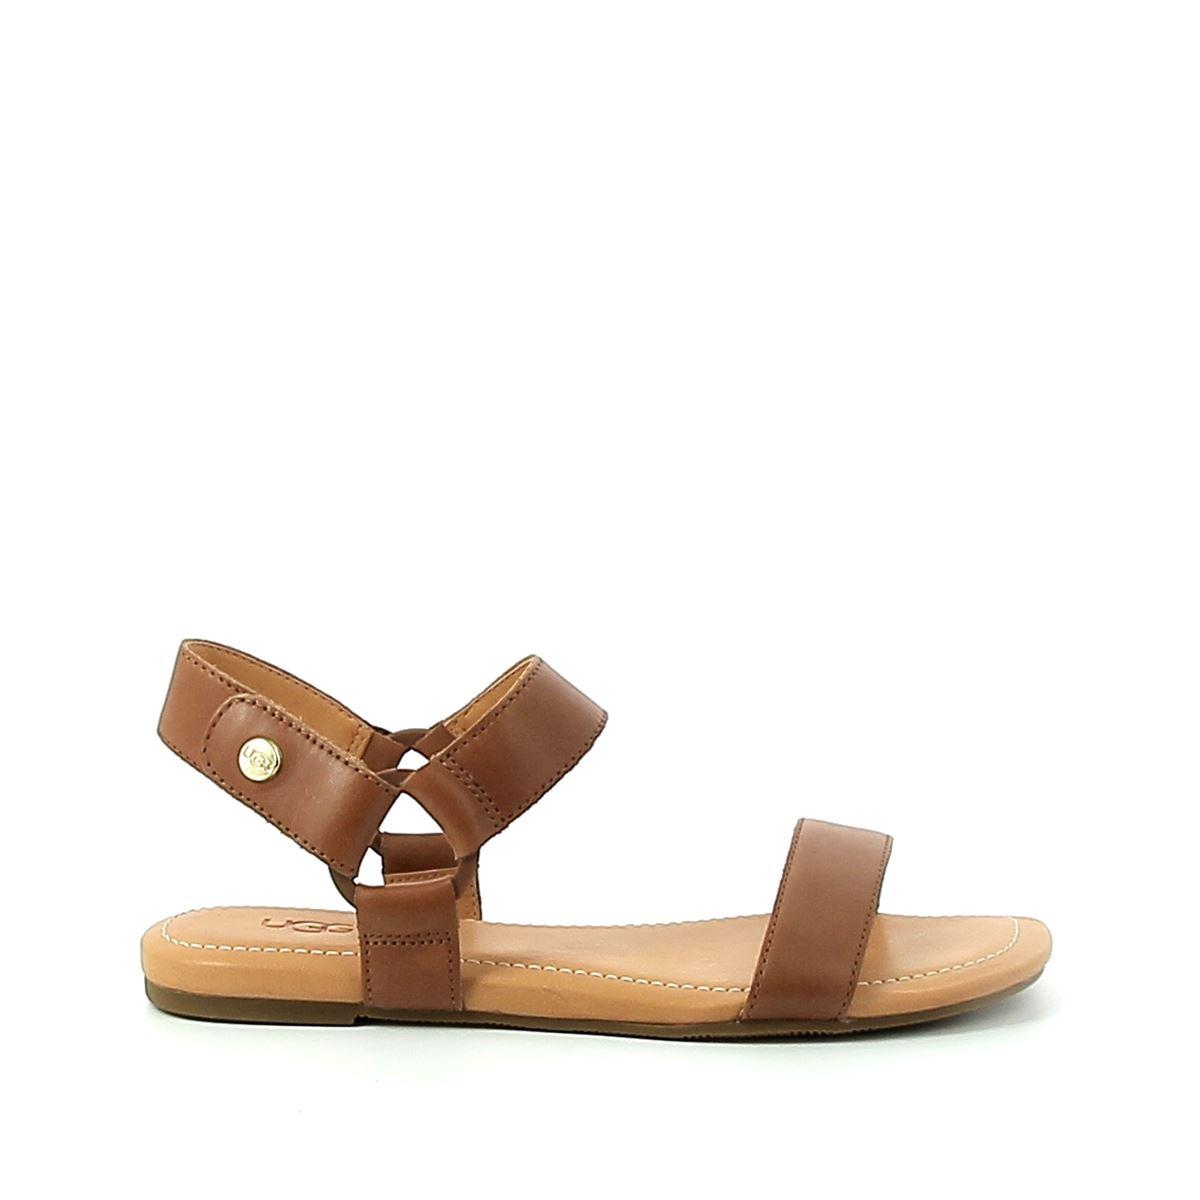 Sandale plate femme UGG Rynell